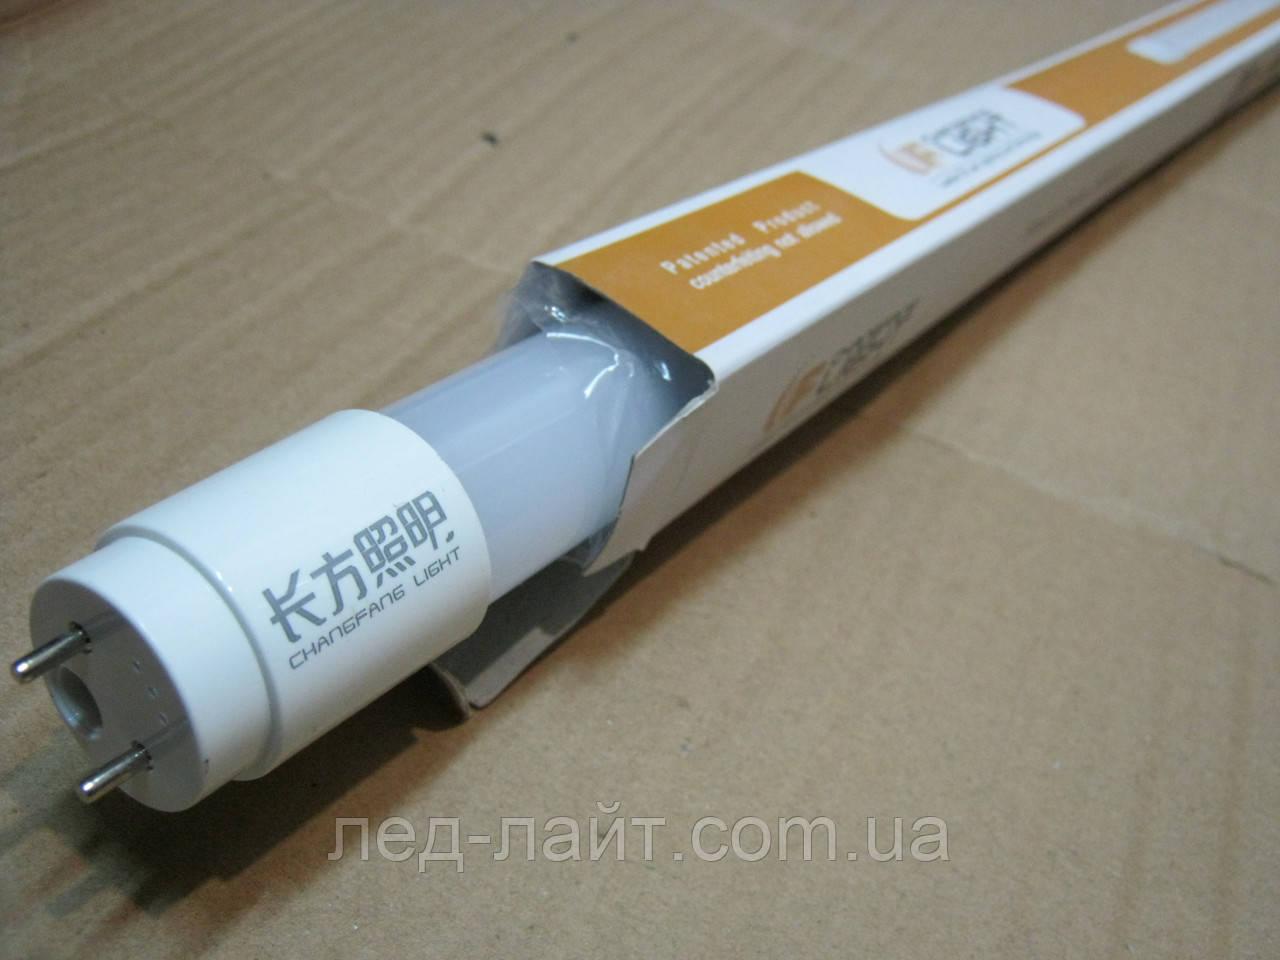 Лампа светодиодная Т8 120см 16Вт тёплая